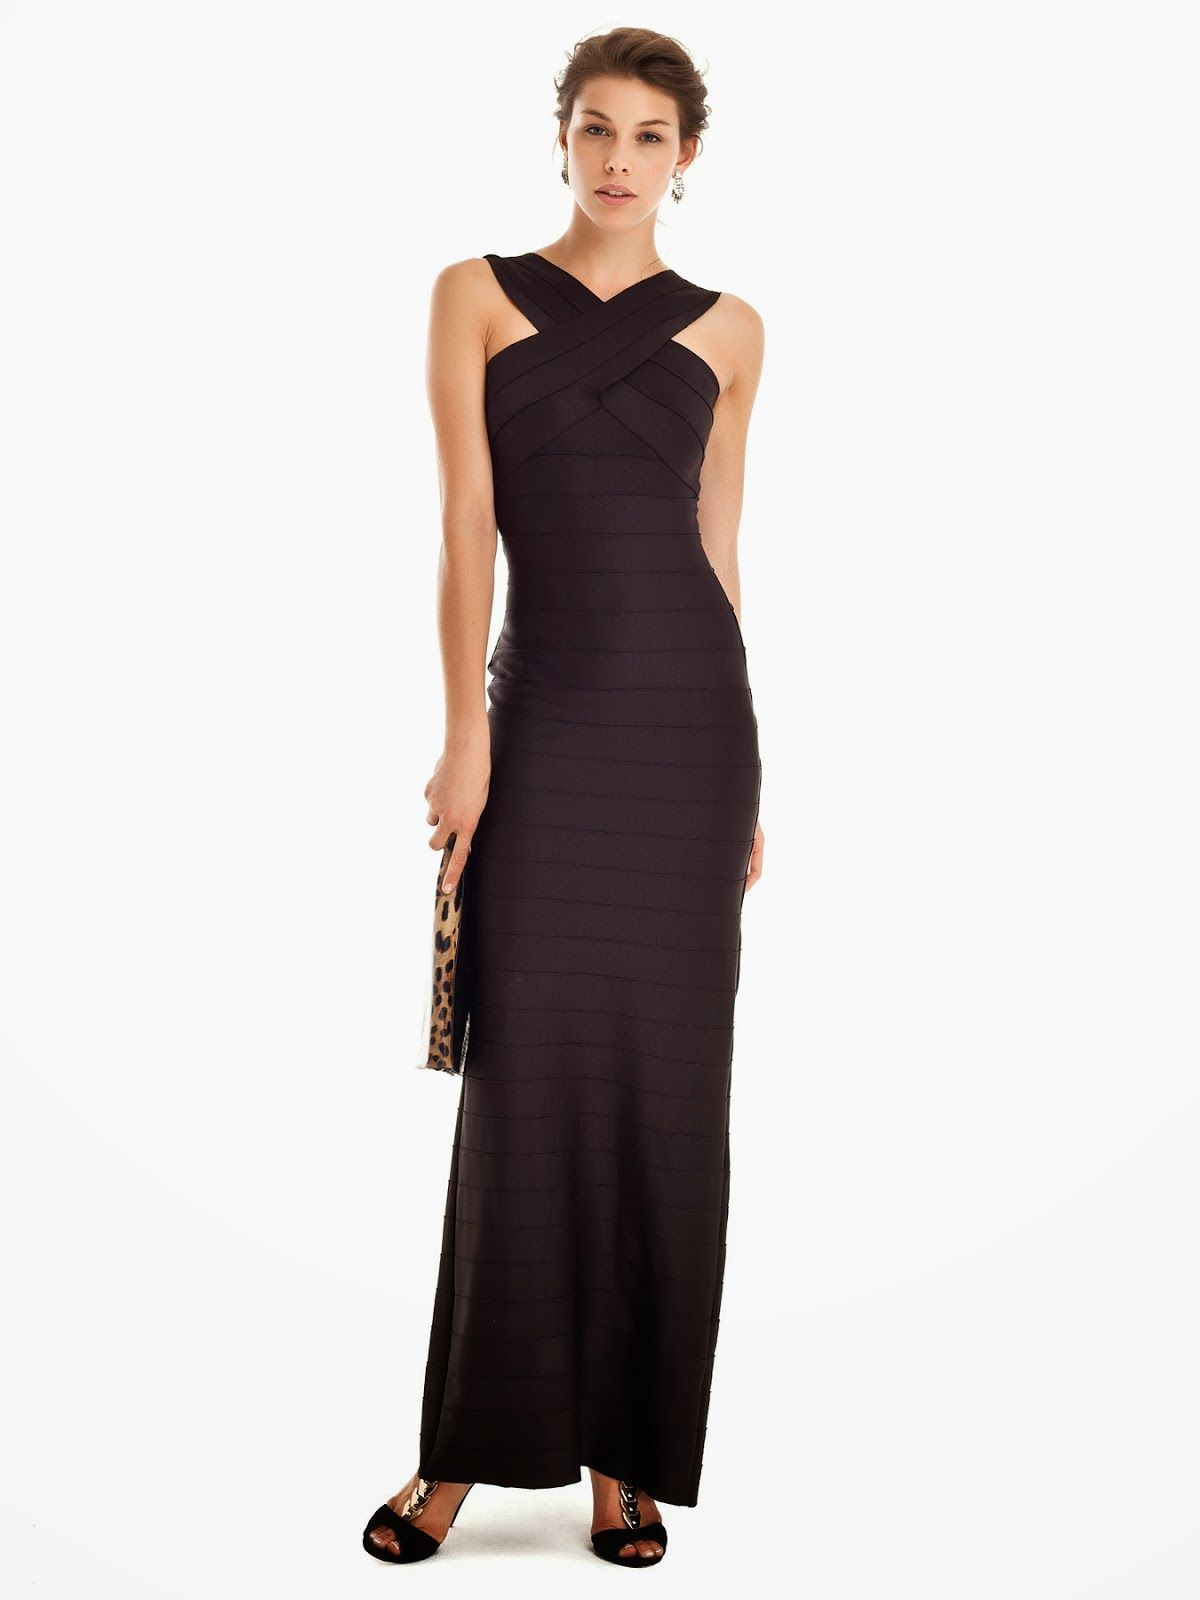 2016 Zara Elbise Trendleri Elbise Bandaj Elbise The Dress